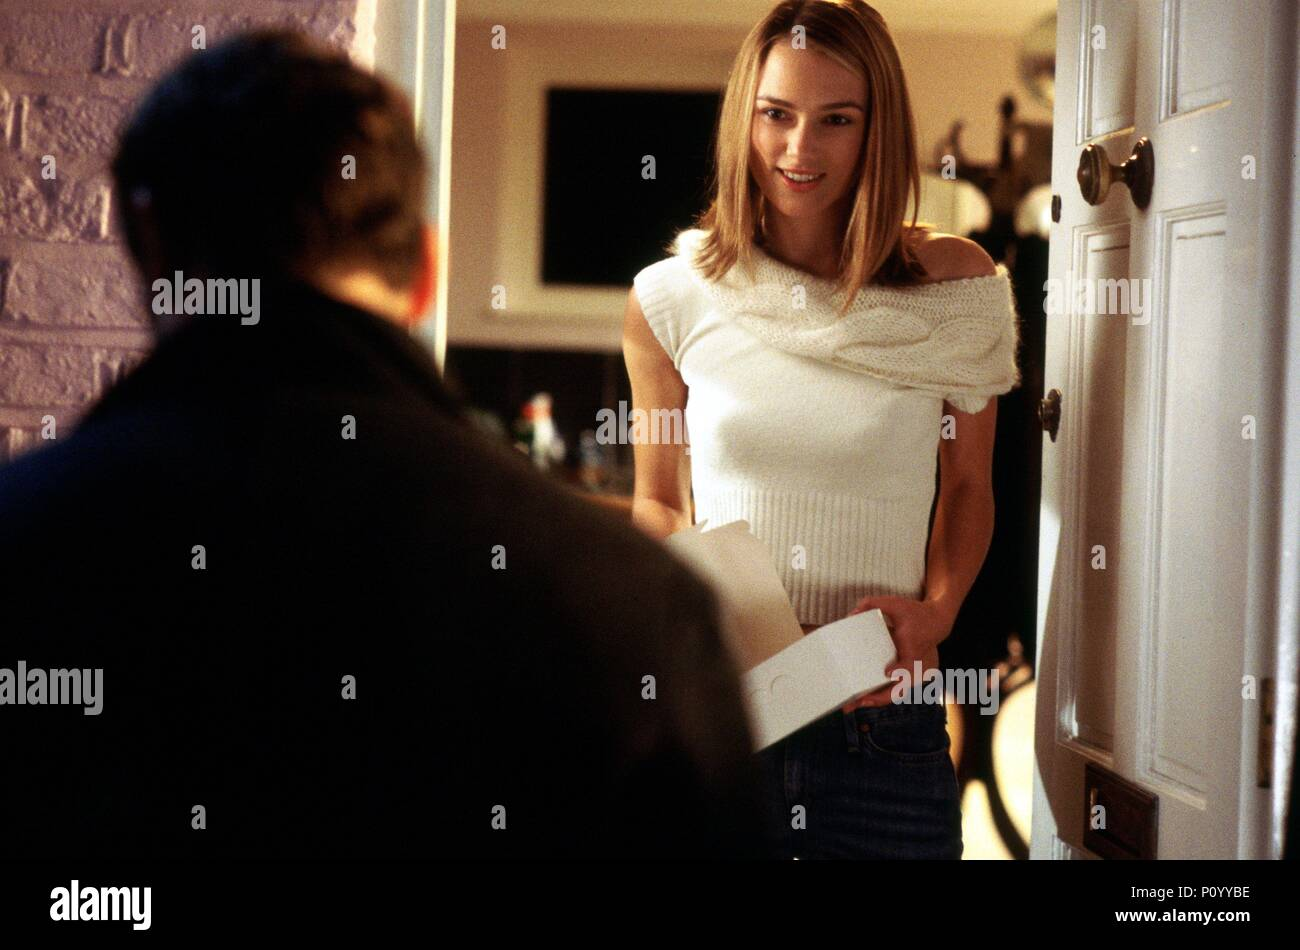 Original Film Title: LOVE ACTUALLY.  English Title: LOVE ACTUALLY.  Film Director: RICHARD CURTIS.  Year: 2003.  Stars: KEIRA KNIGHTLEY. Credit: UNIVERSAL STUDIOS / MOUNTAIN, PETER / Album - Stock Image